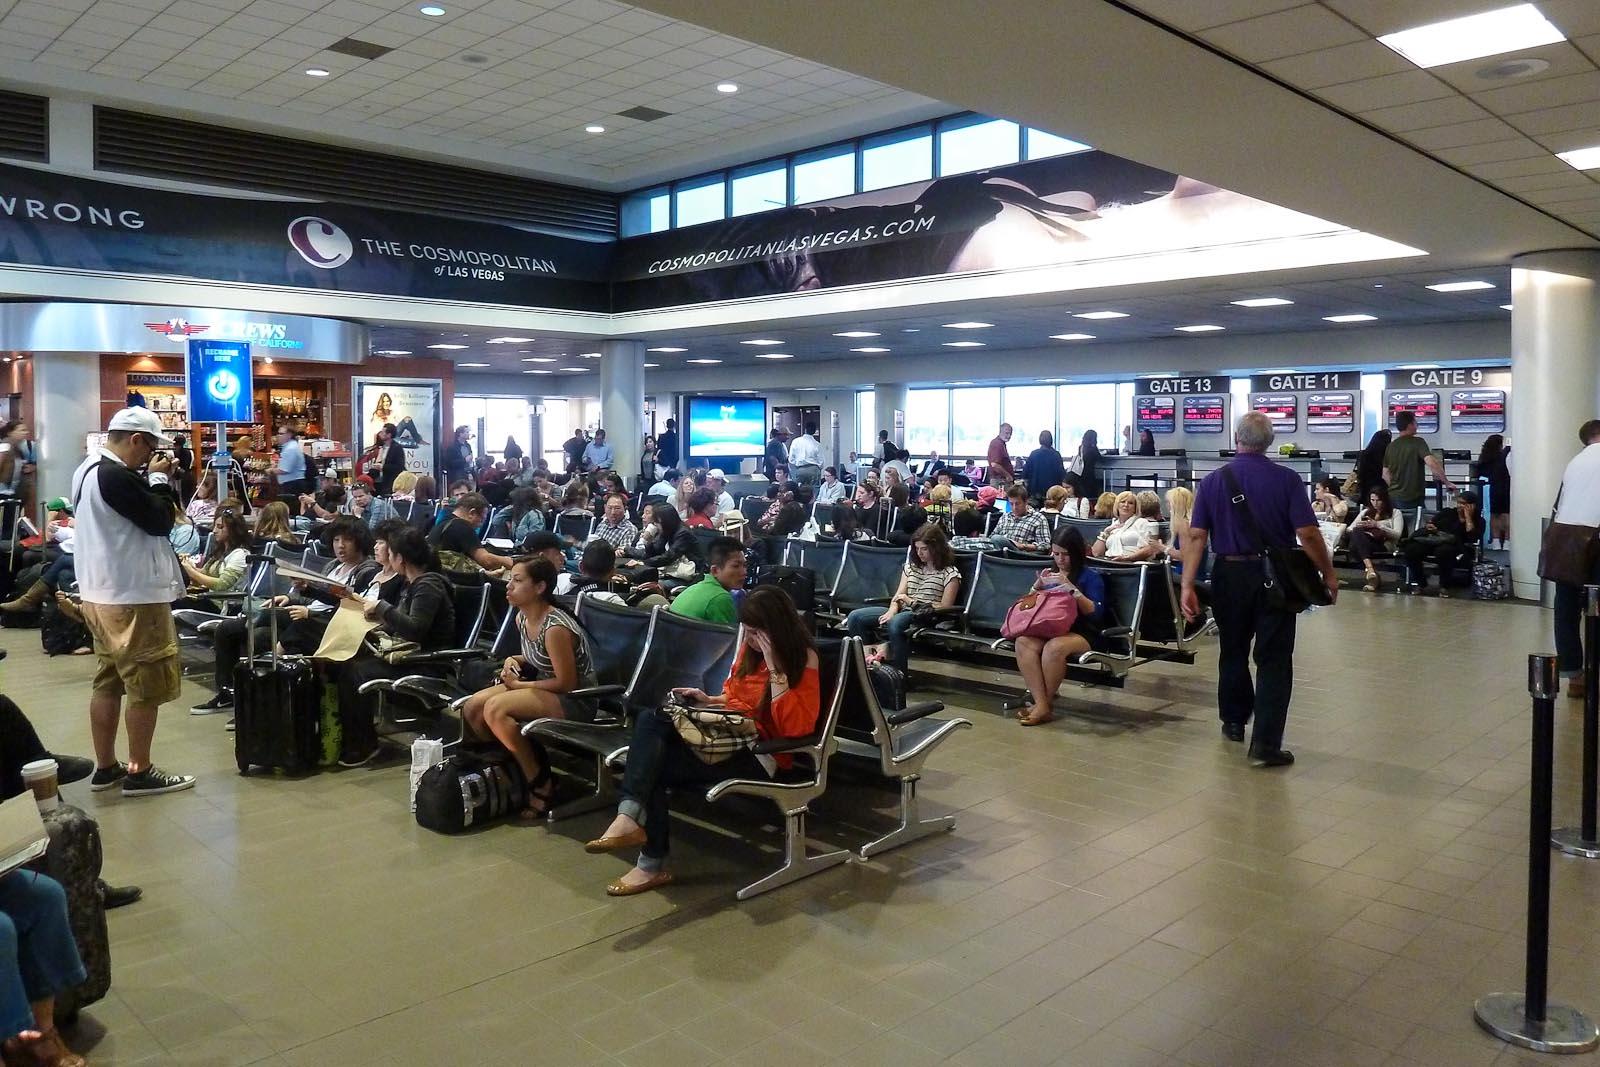 Зал ожидания перед выходами на посадку в аэропорту Лос-Анджелес